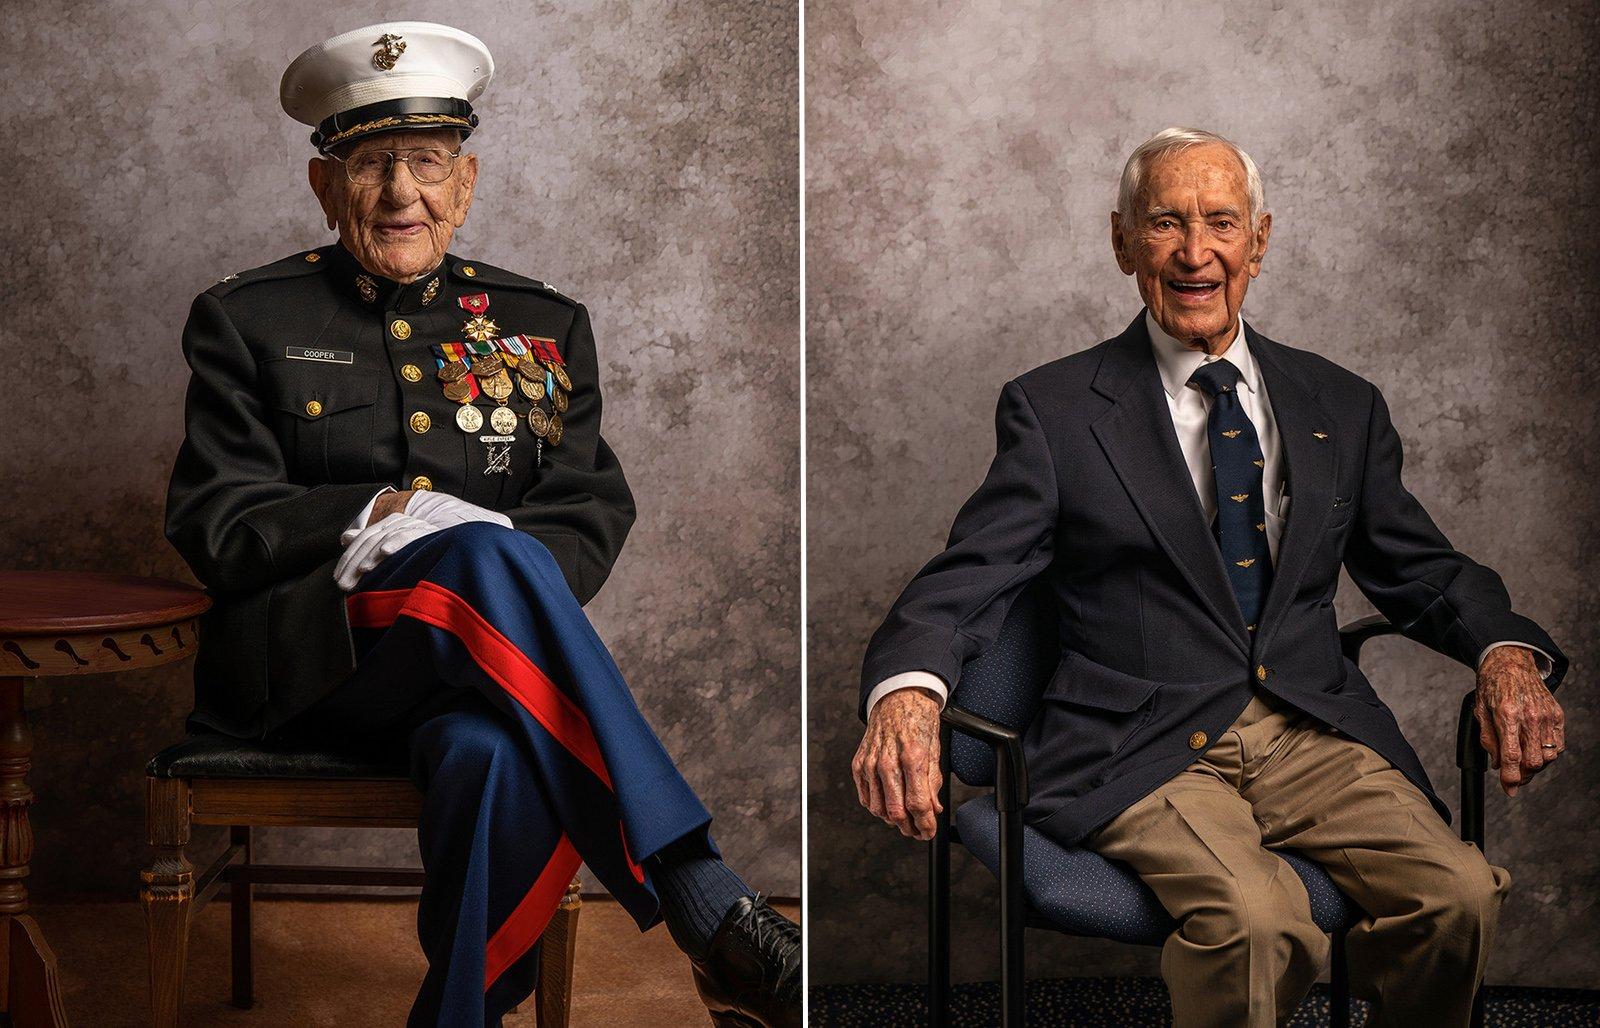 Portraits of Honor: